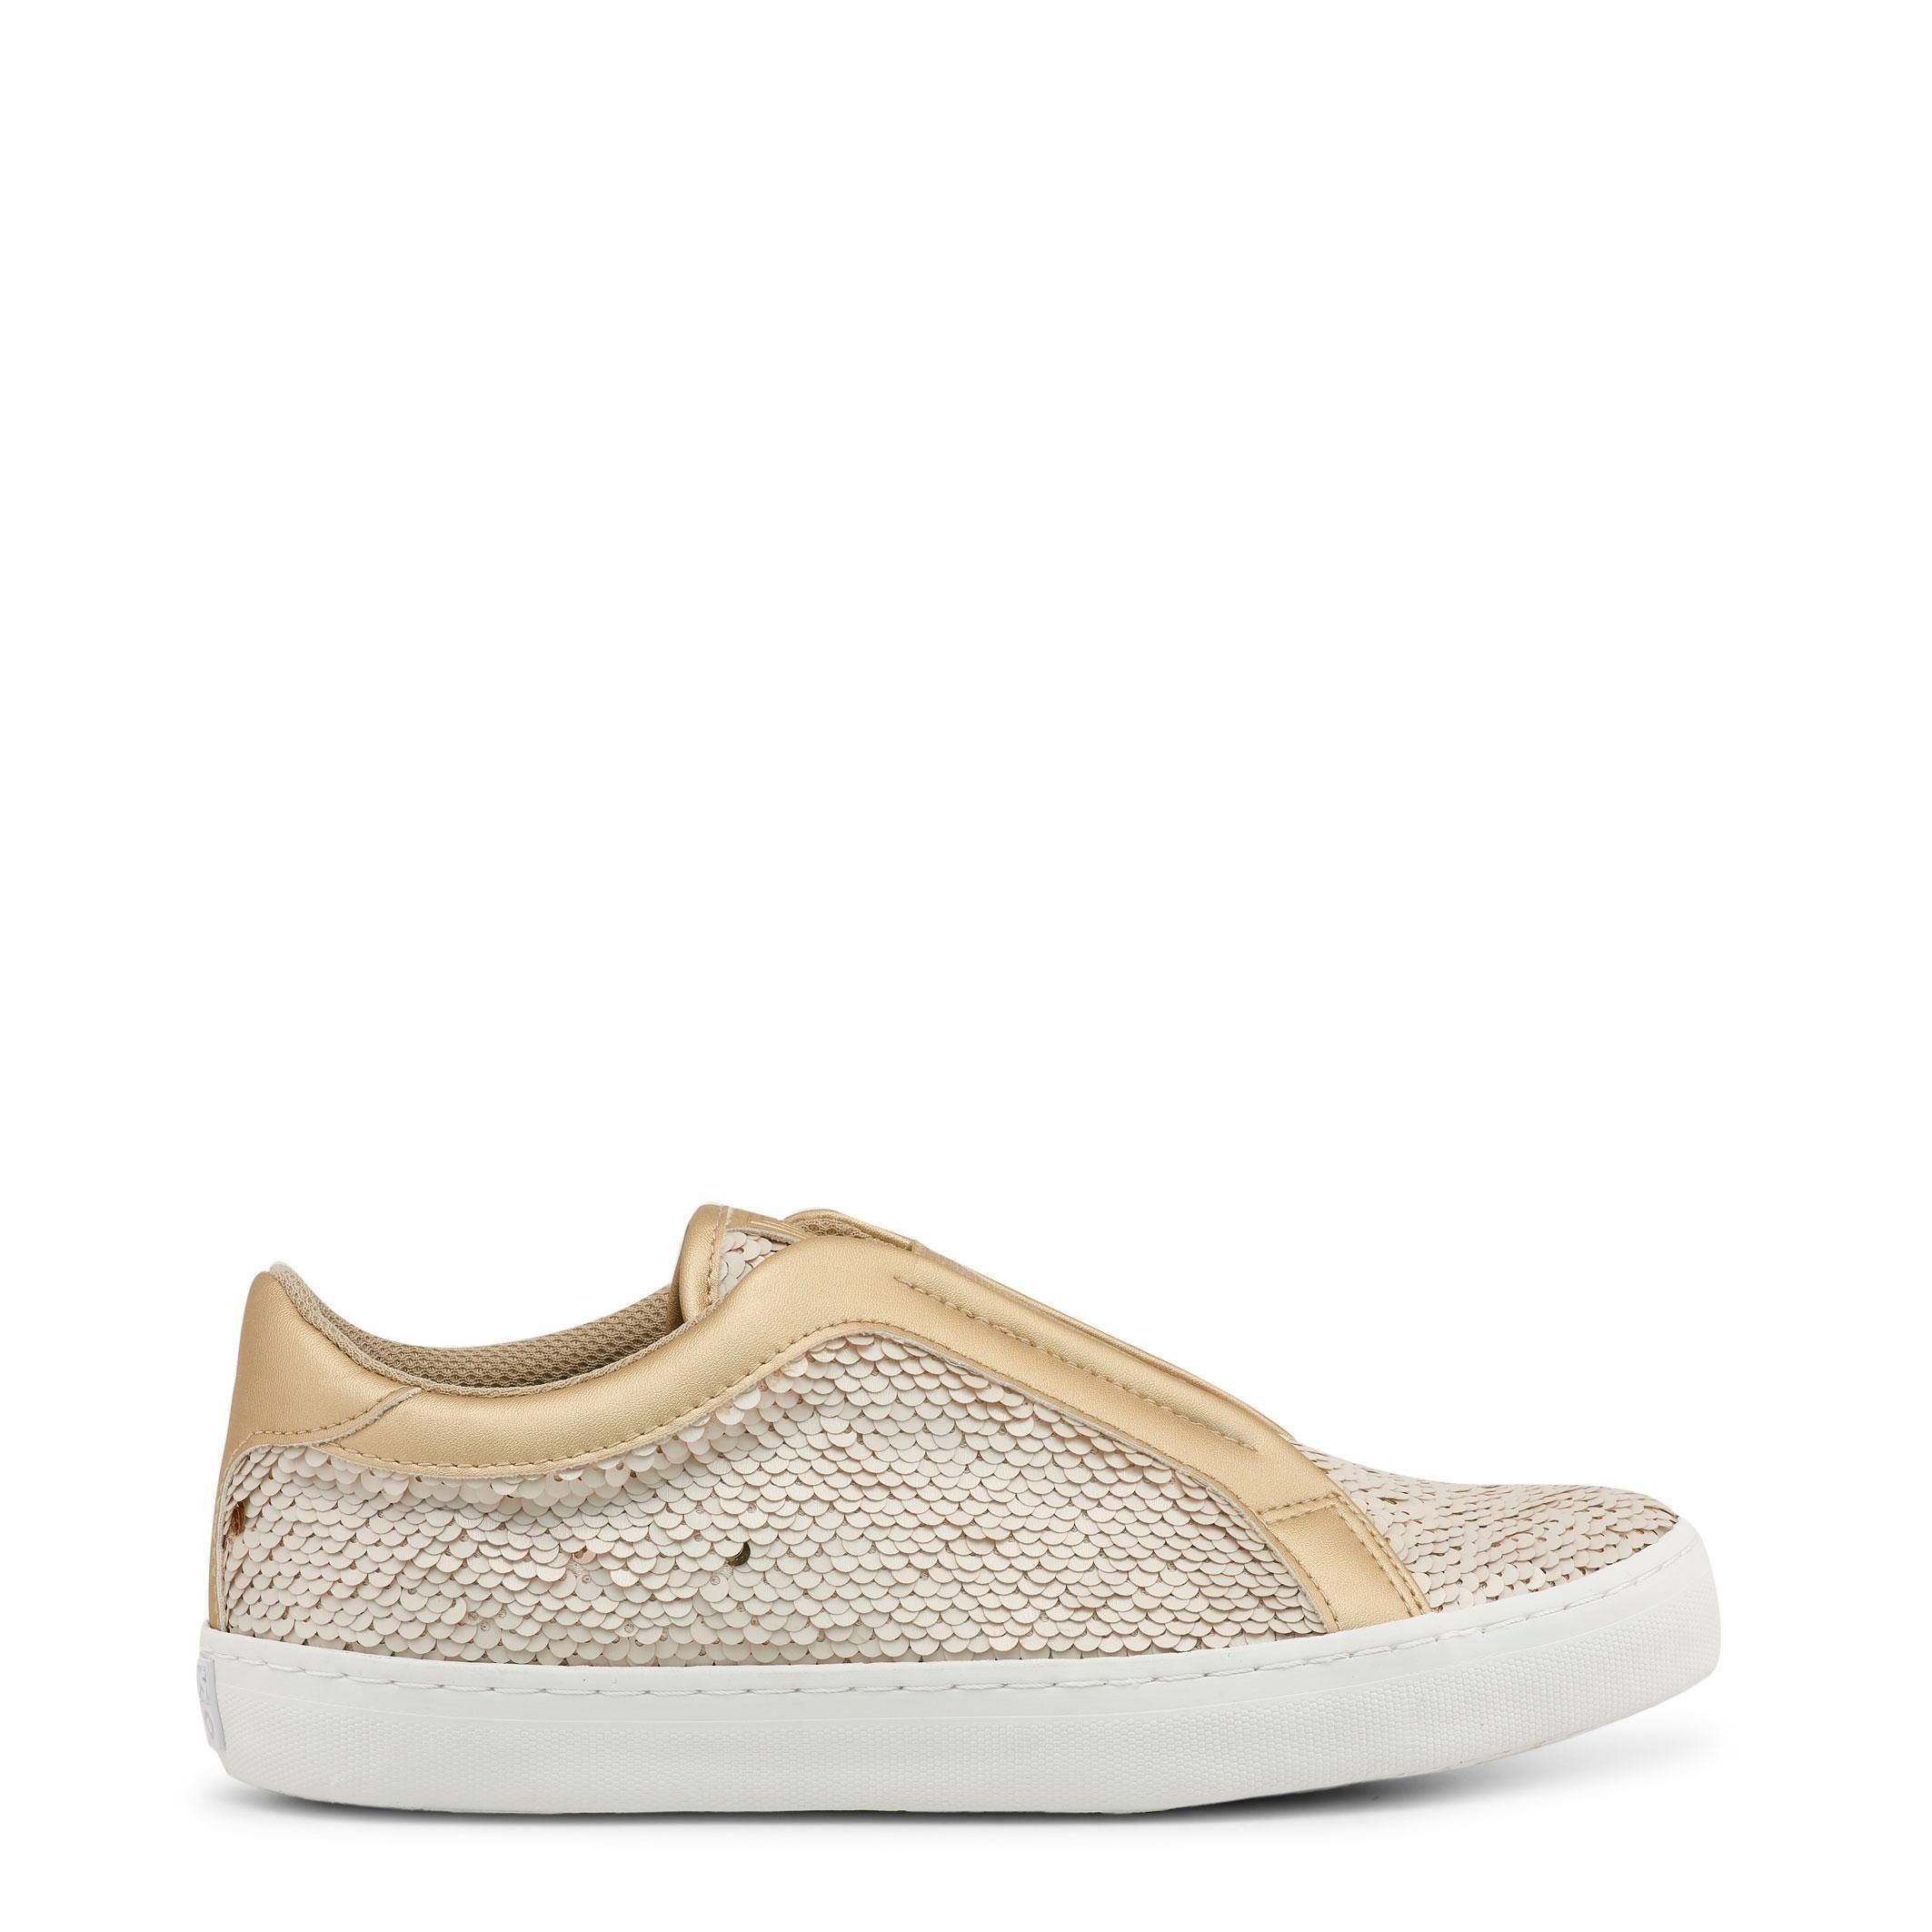 Gioseppo ALANA Yellow sneakers, Sneakers men fashion